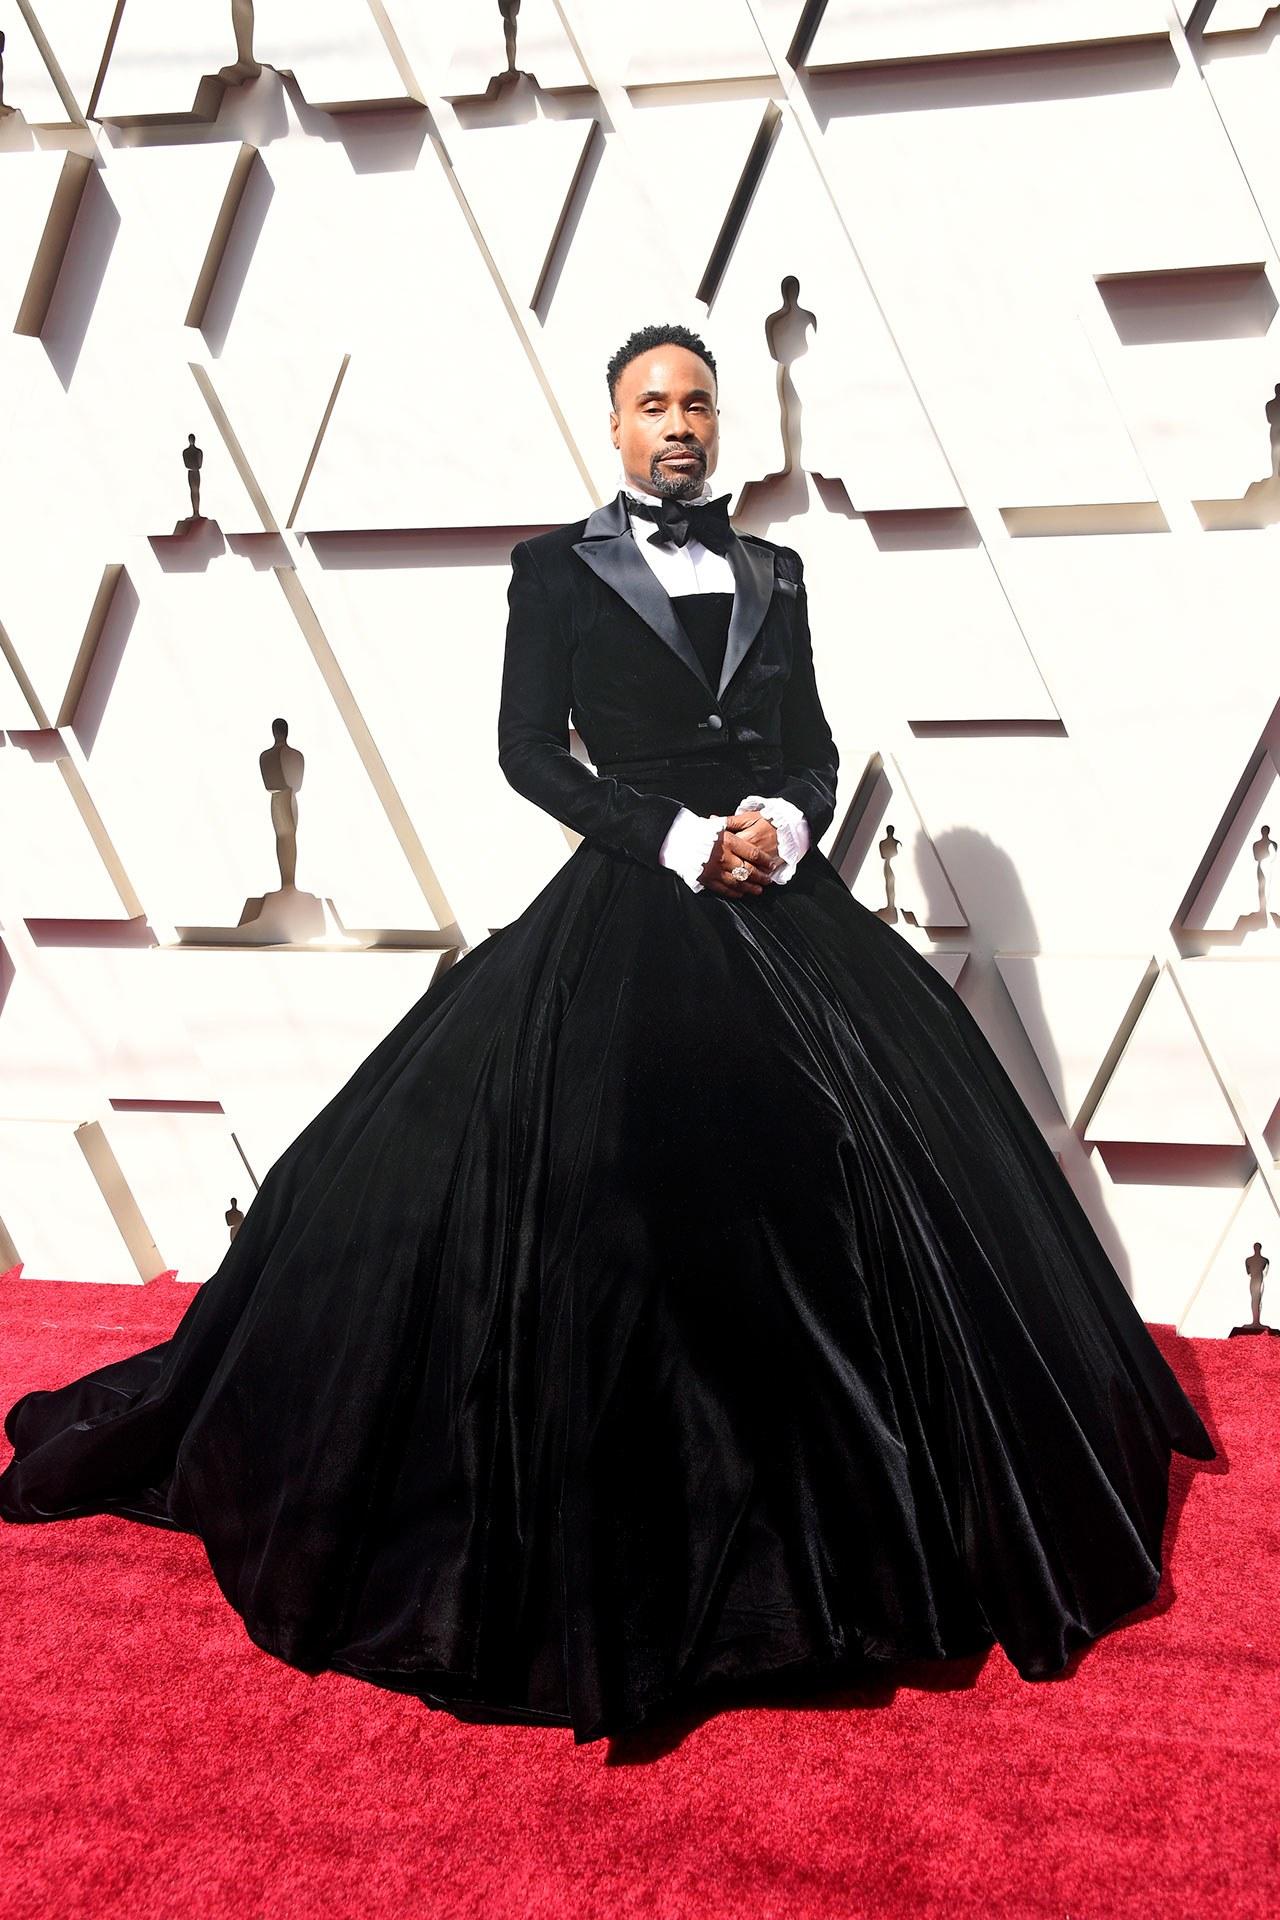 Billy-Porter-The-Oscars2019-Vogueint-Feb24-Getty-Images.jpg